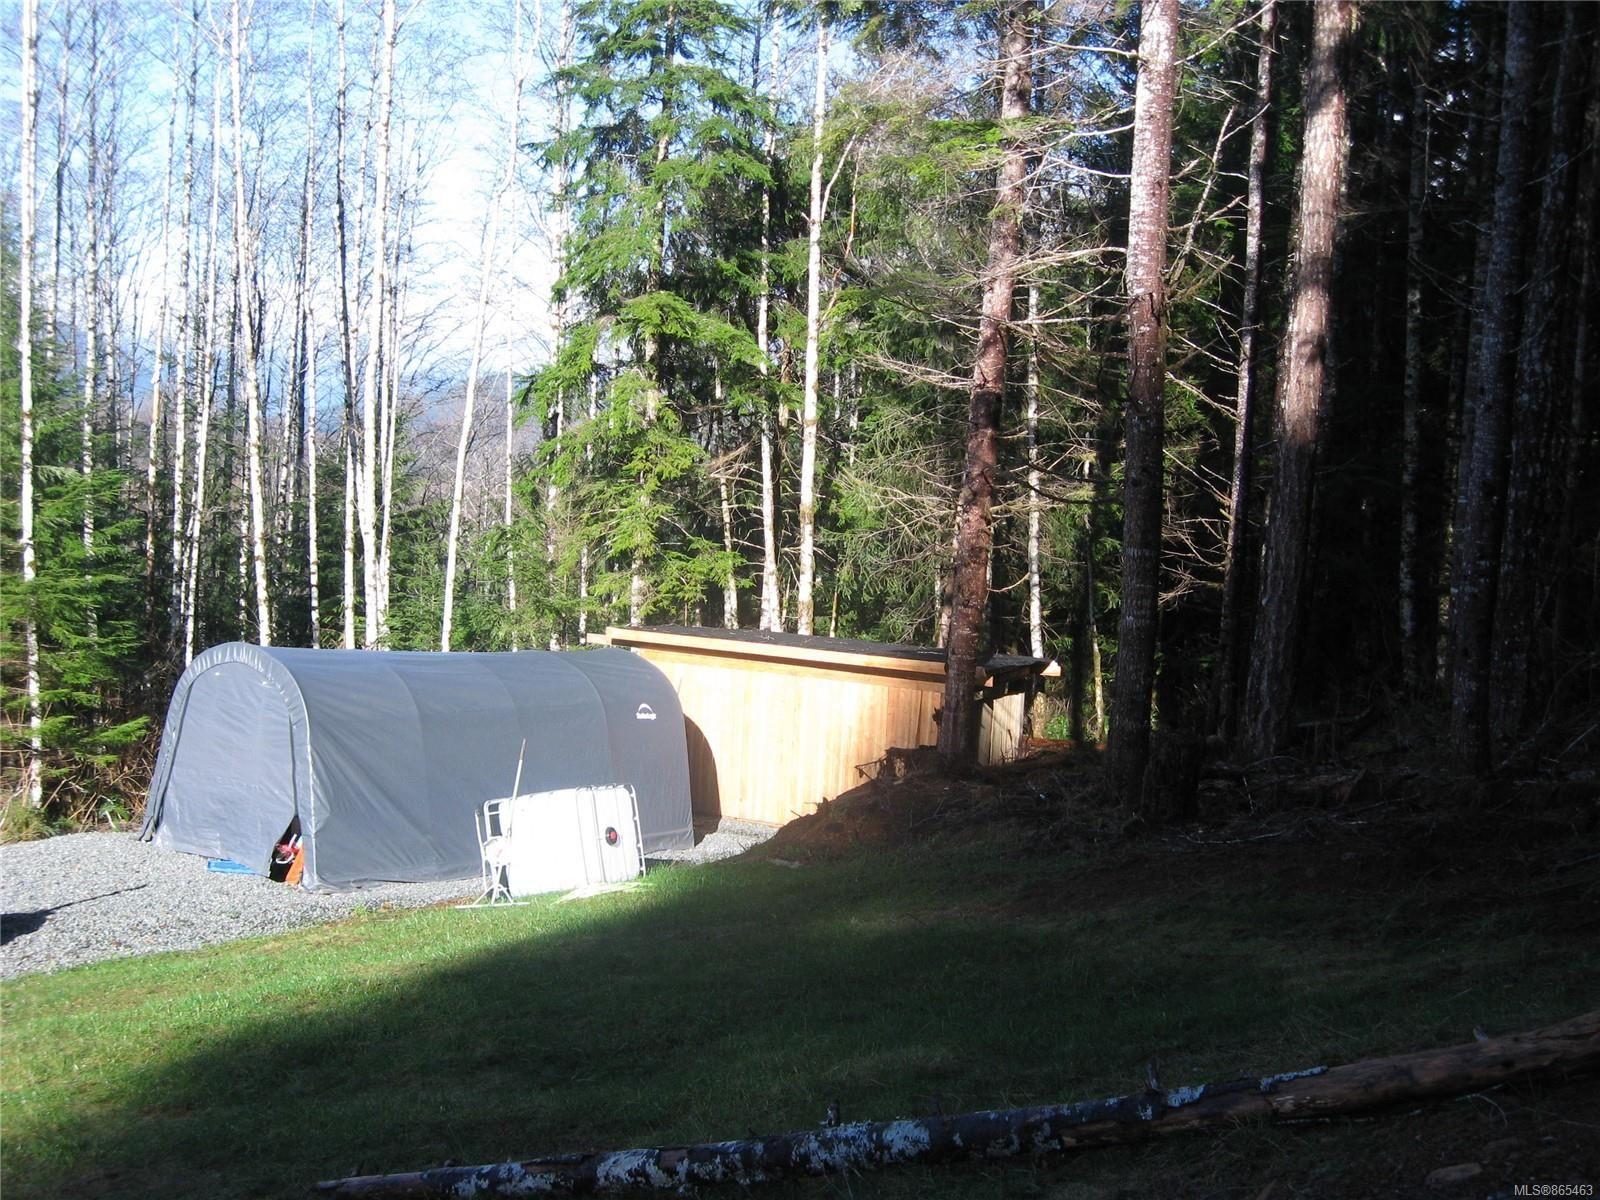 Photo 15: Photos: 1230 Cottonwood Rd in : NI Kelsey Bay/Sayward Land for sale (North Island)  : MLS®# 865463